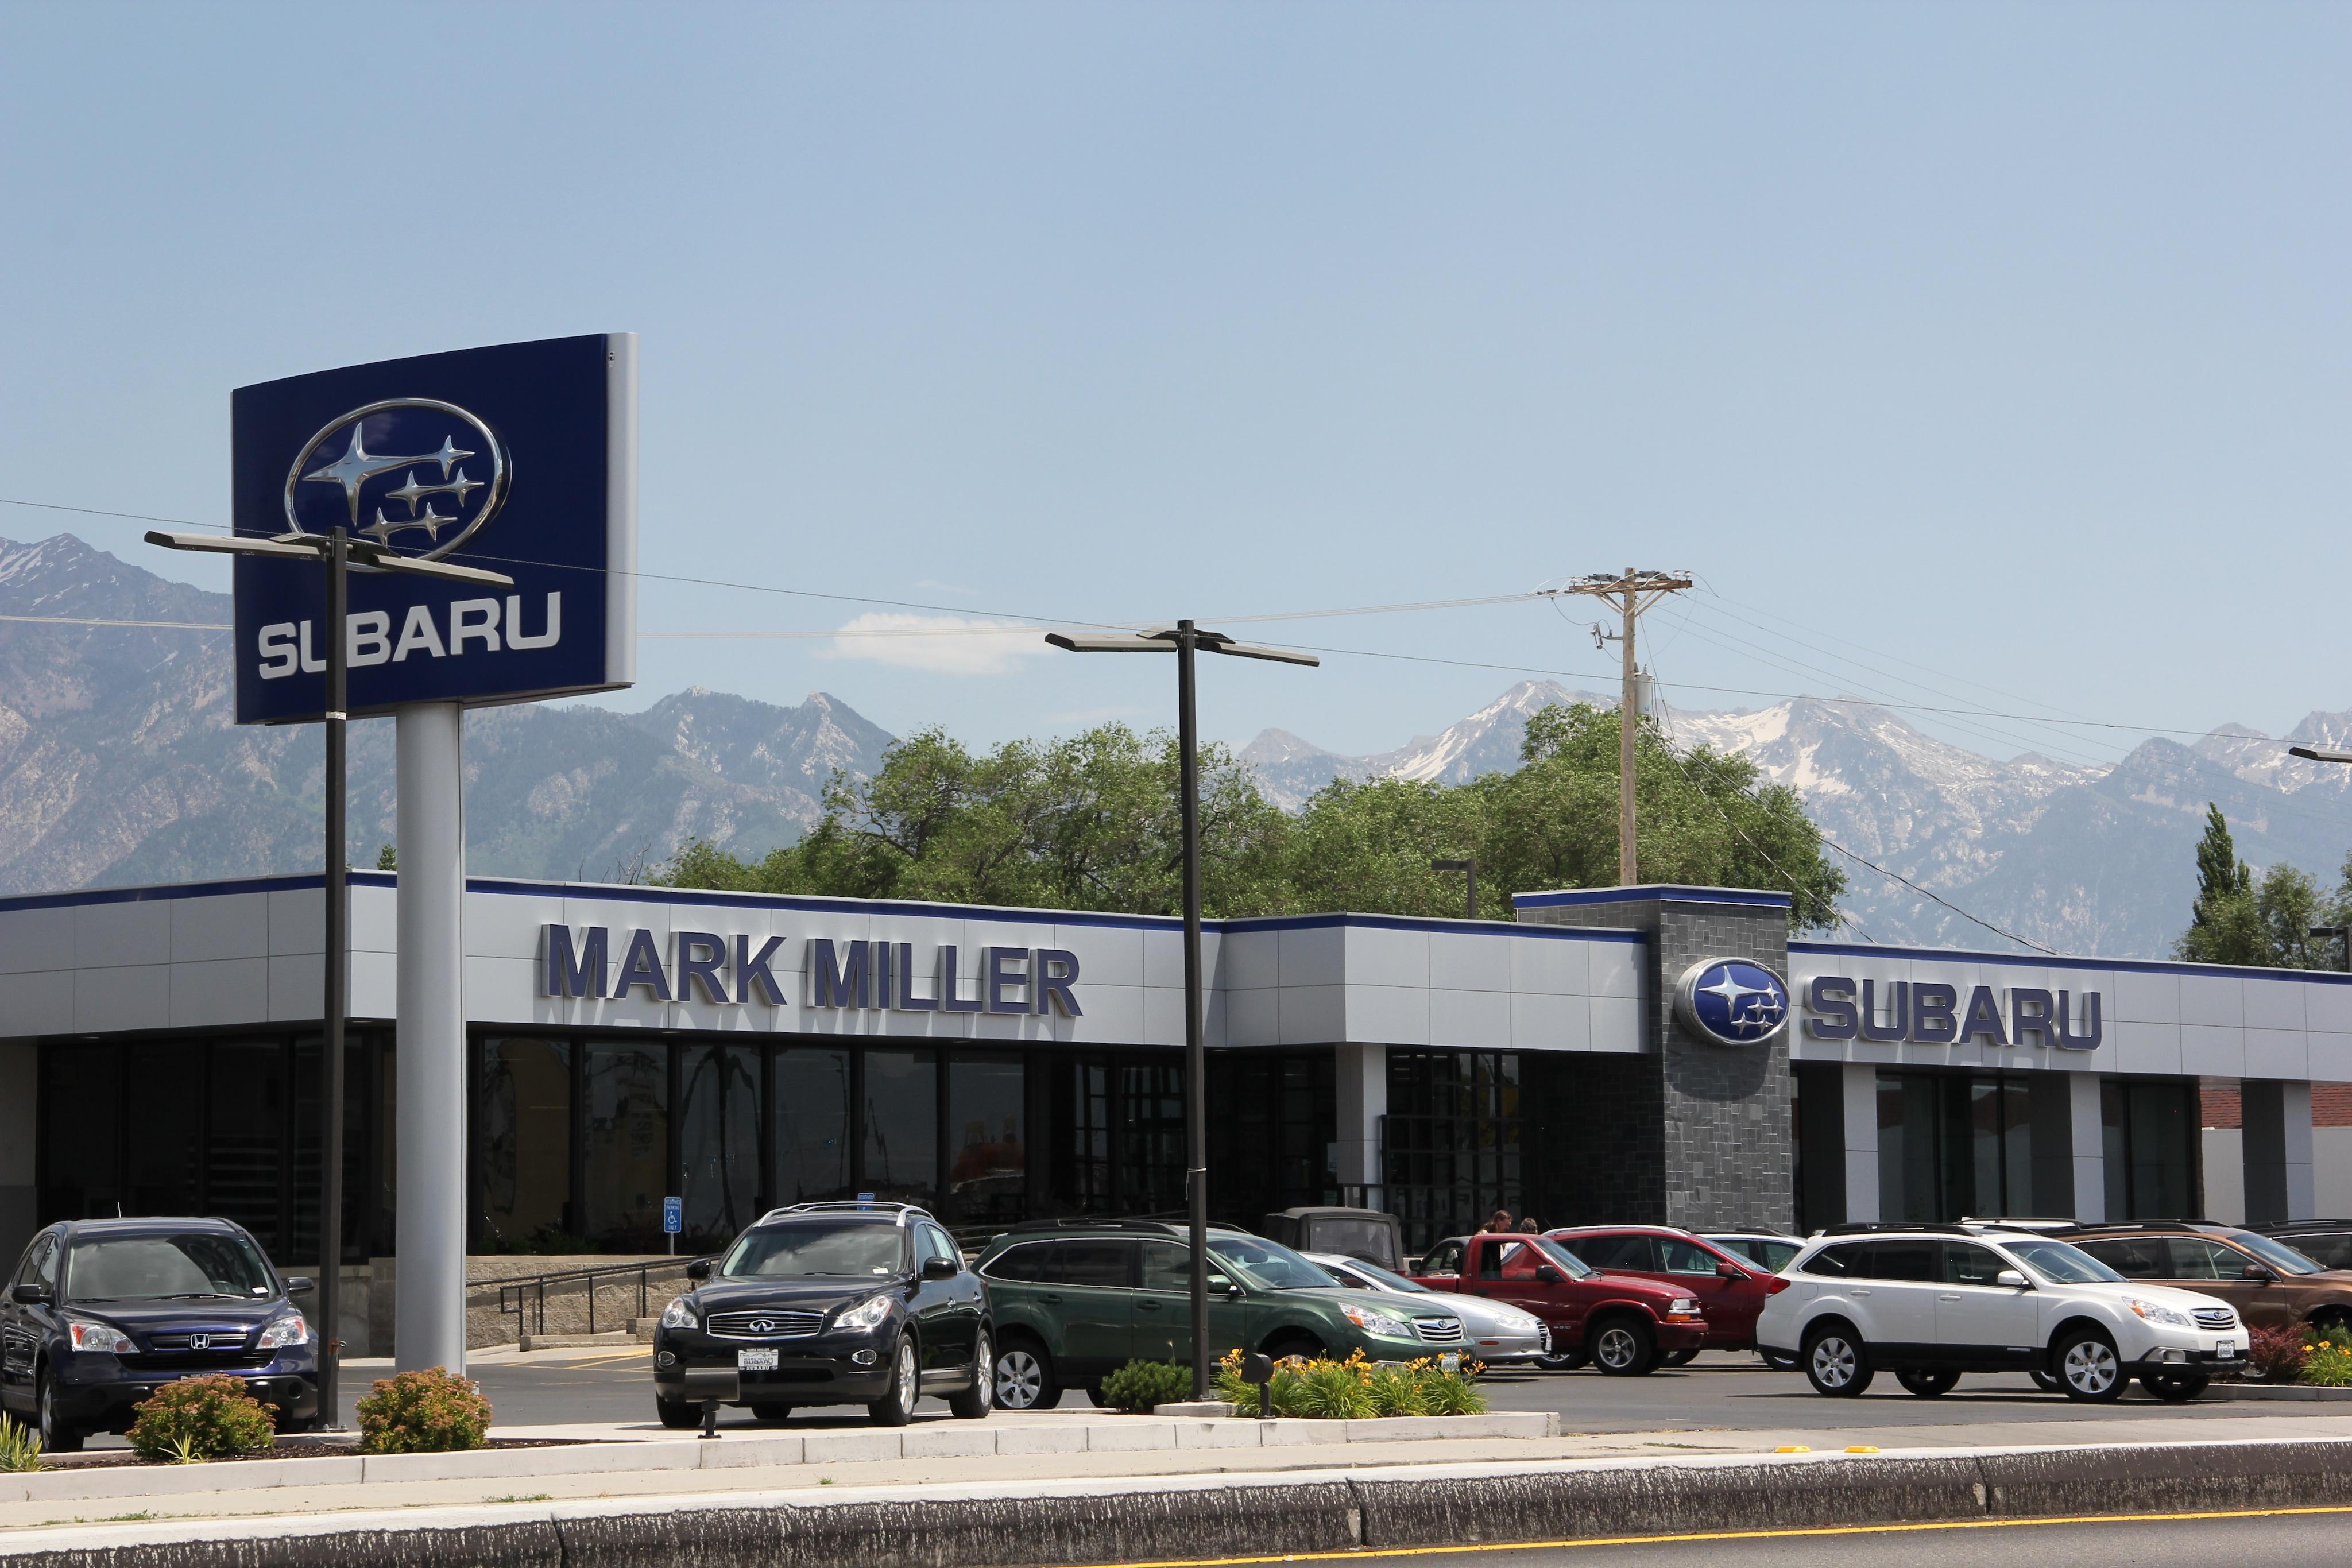 mark miller subaru south towne dealer near salt lake city autos post. Black Bedroom Furniture Sets. Home Design Ideas